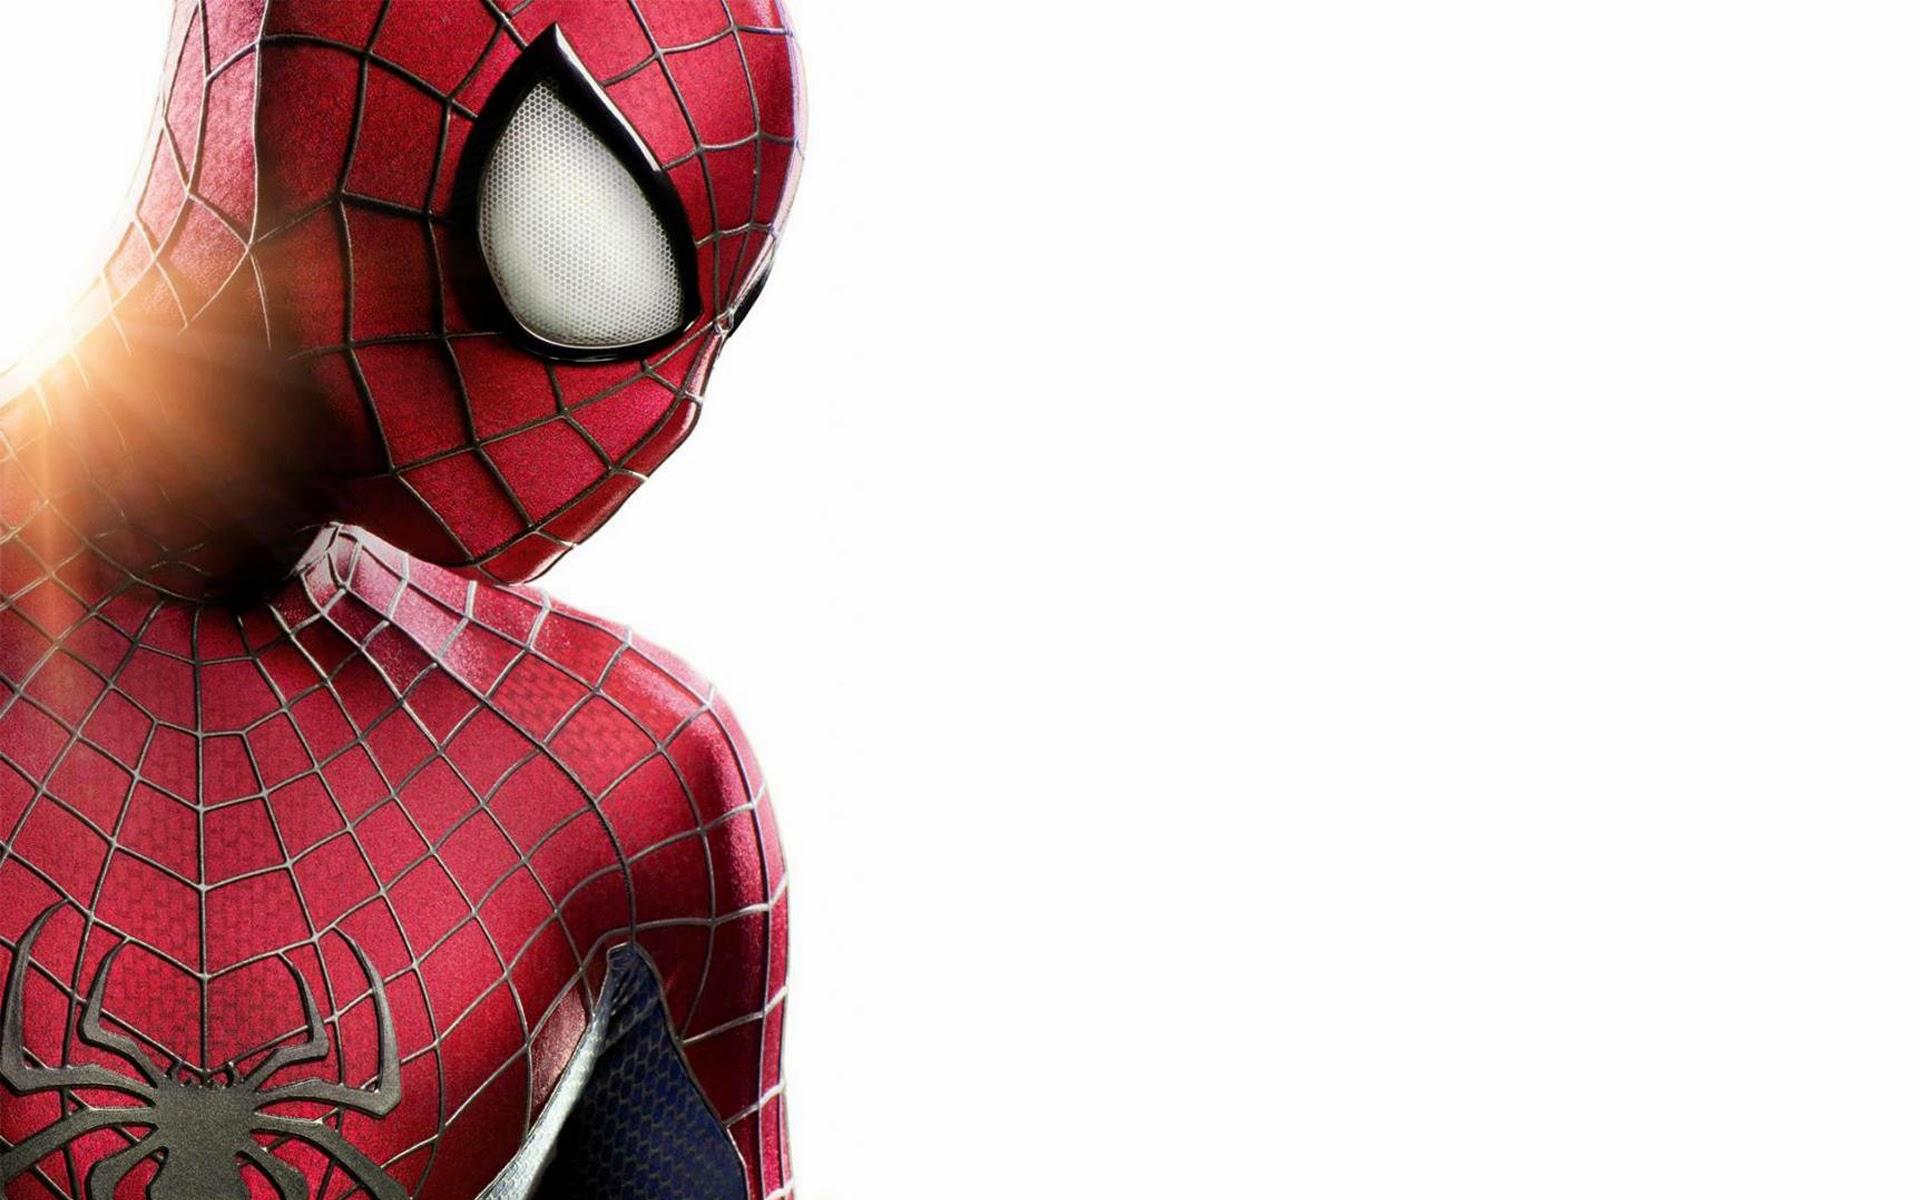 the amazing spider man 2 2014 movie hd wallpaper 1920x1200 1920x1200